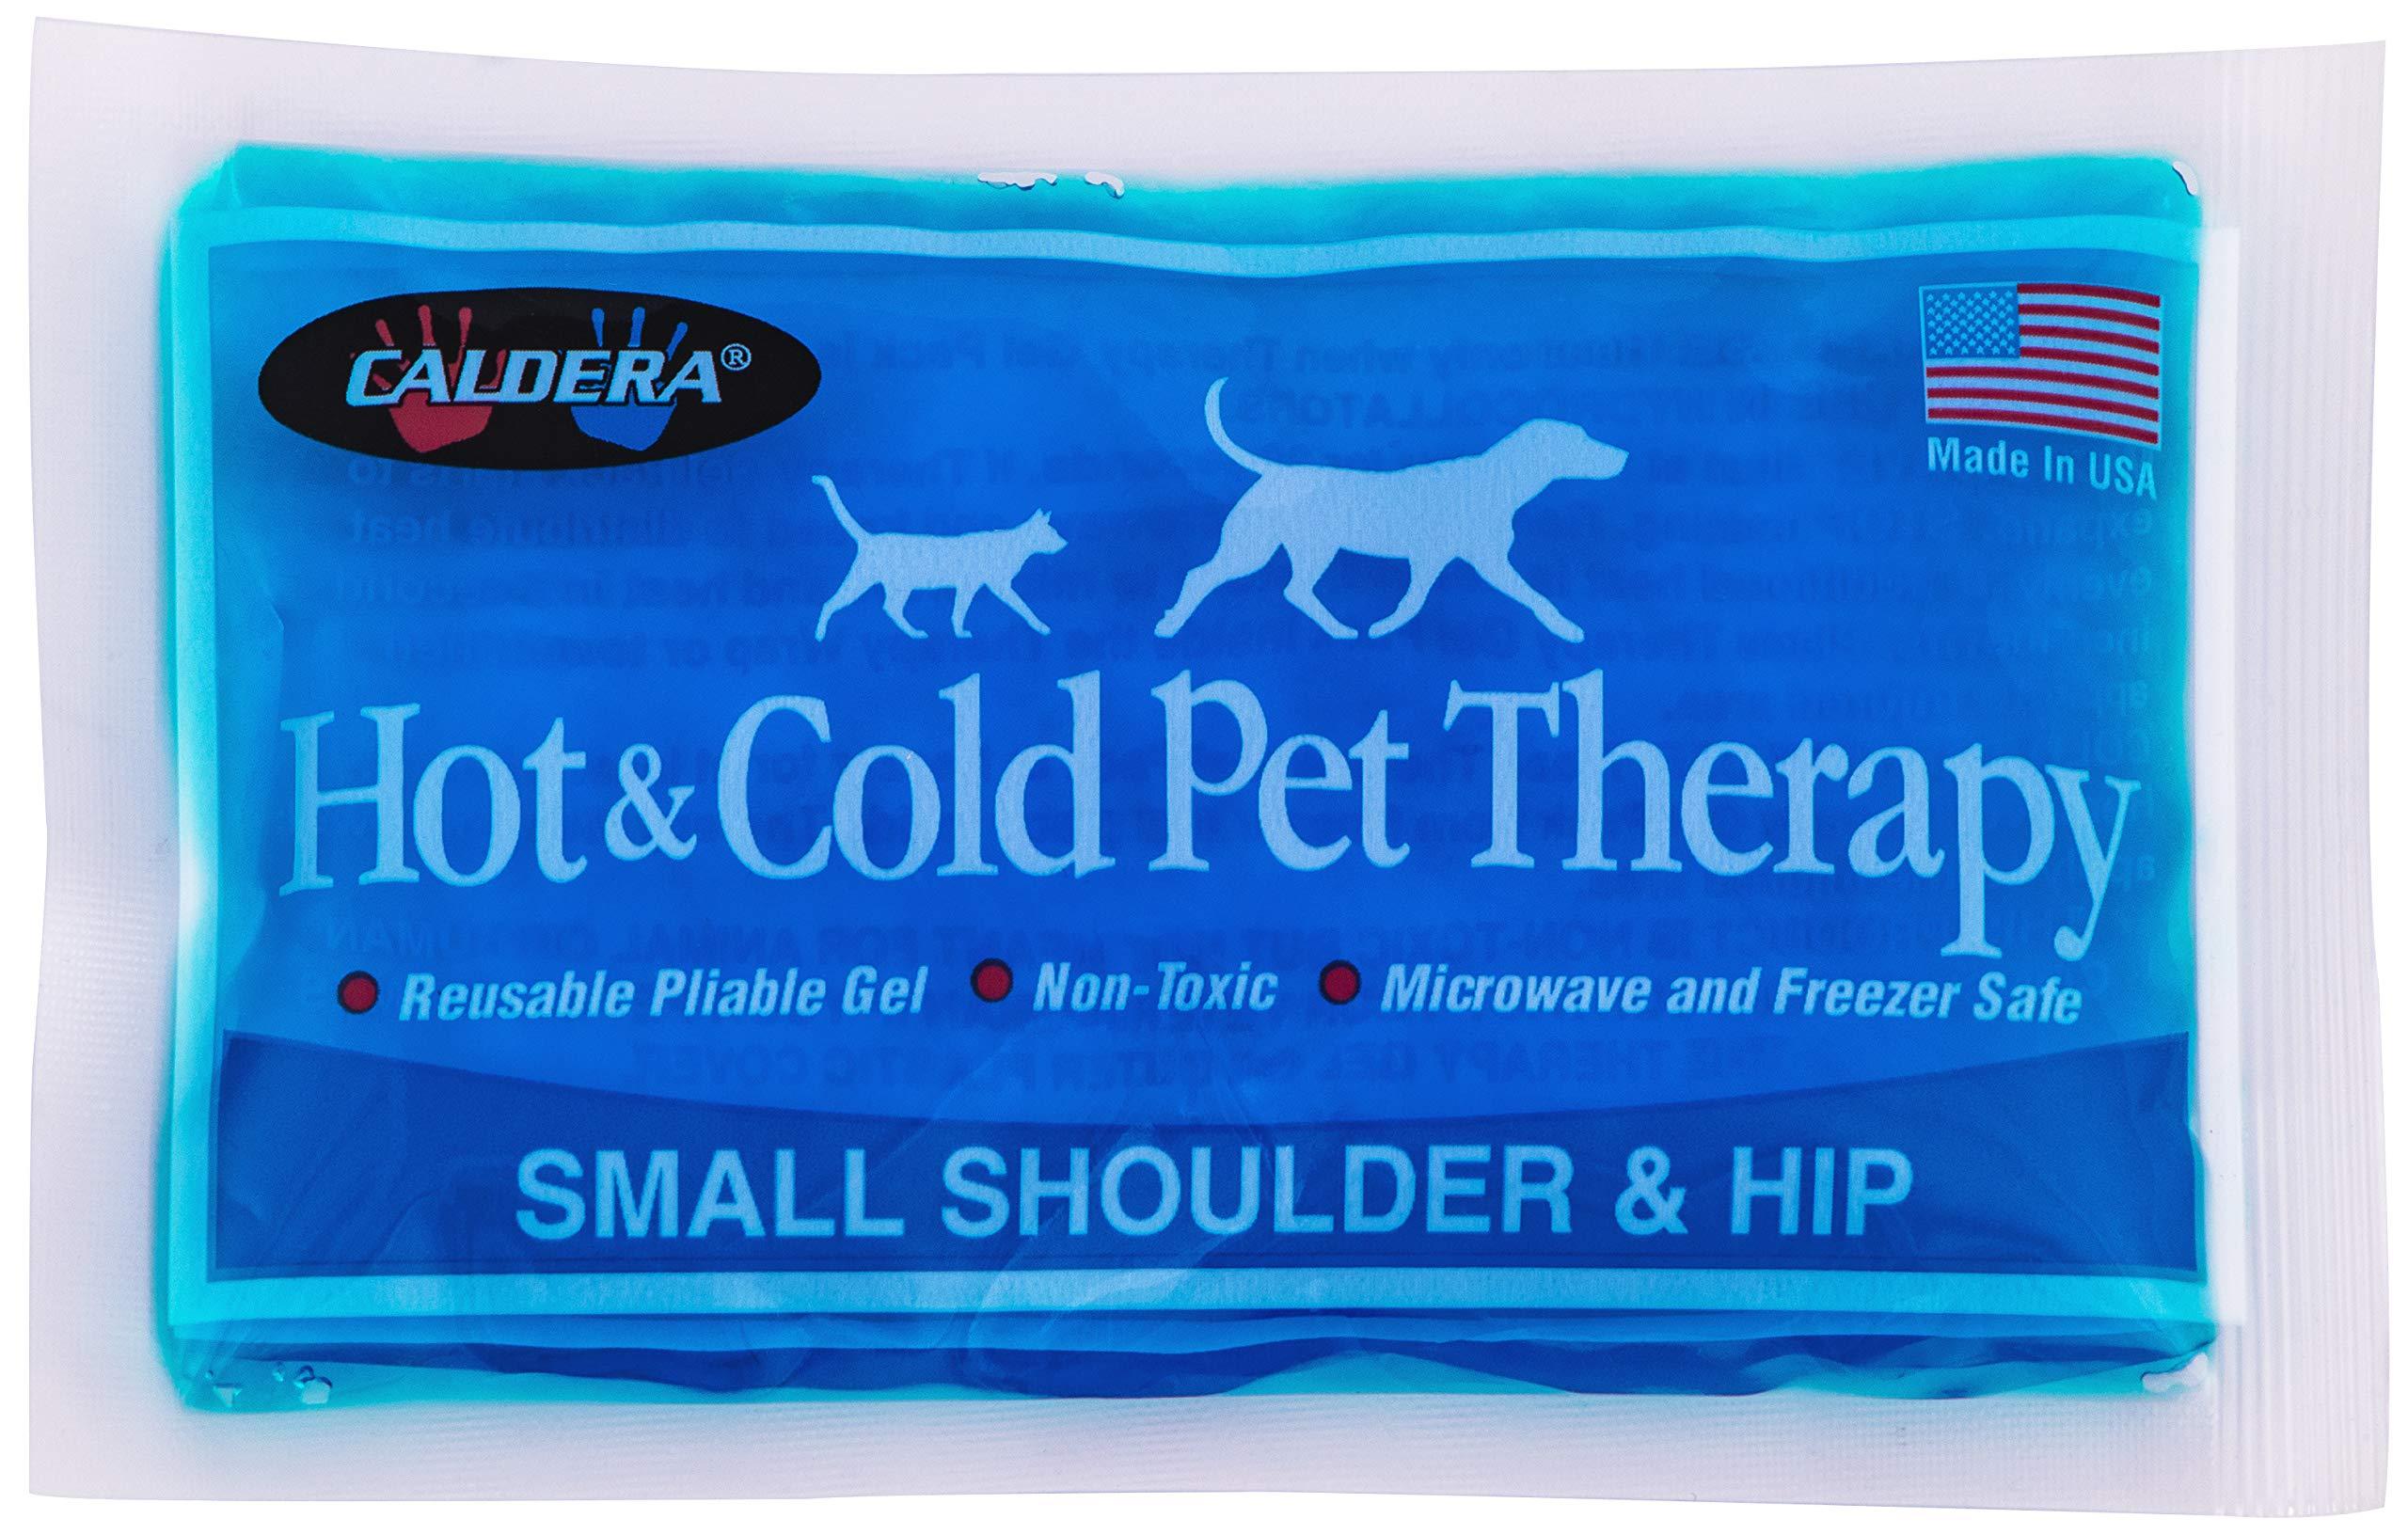 Caldera Small Shoulder & Hip Pet Therapy Gel Pack